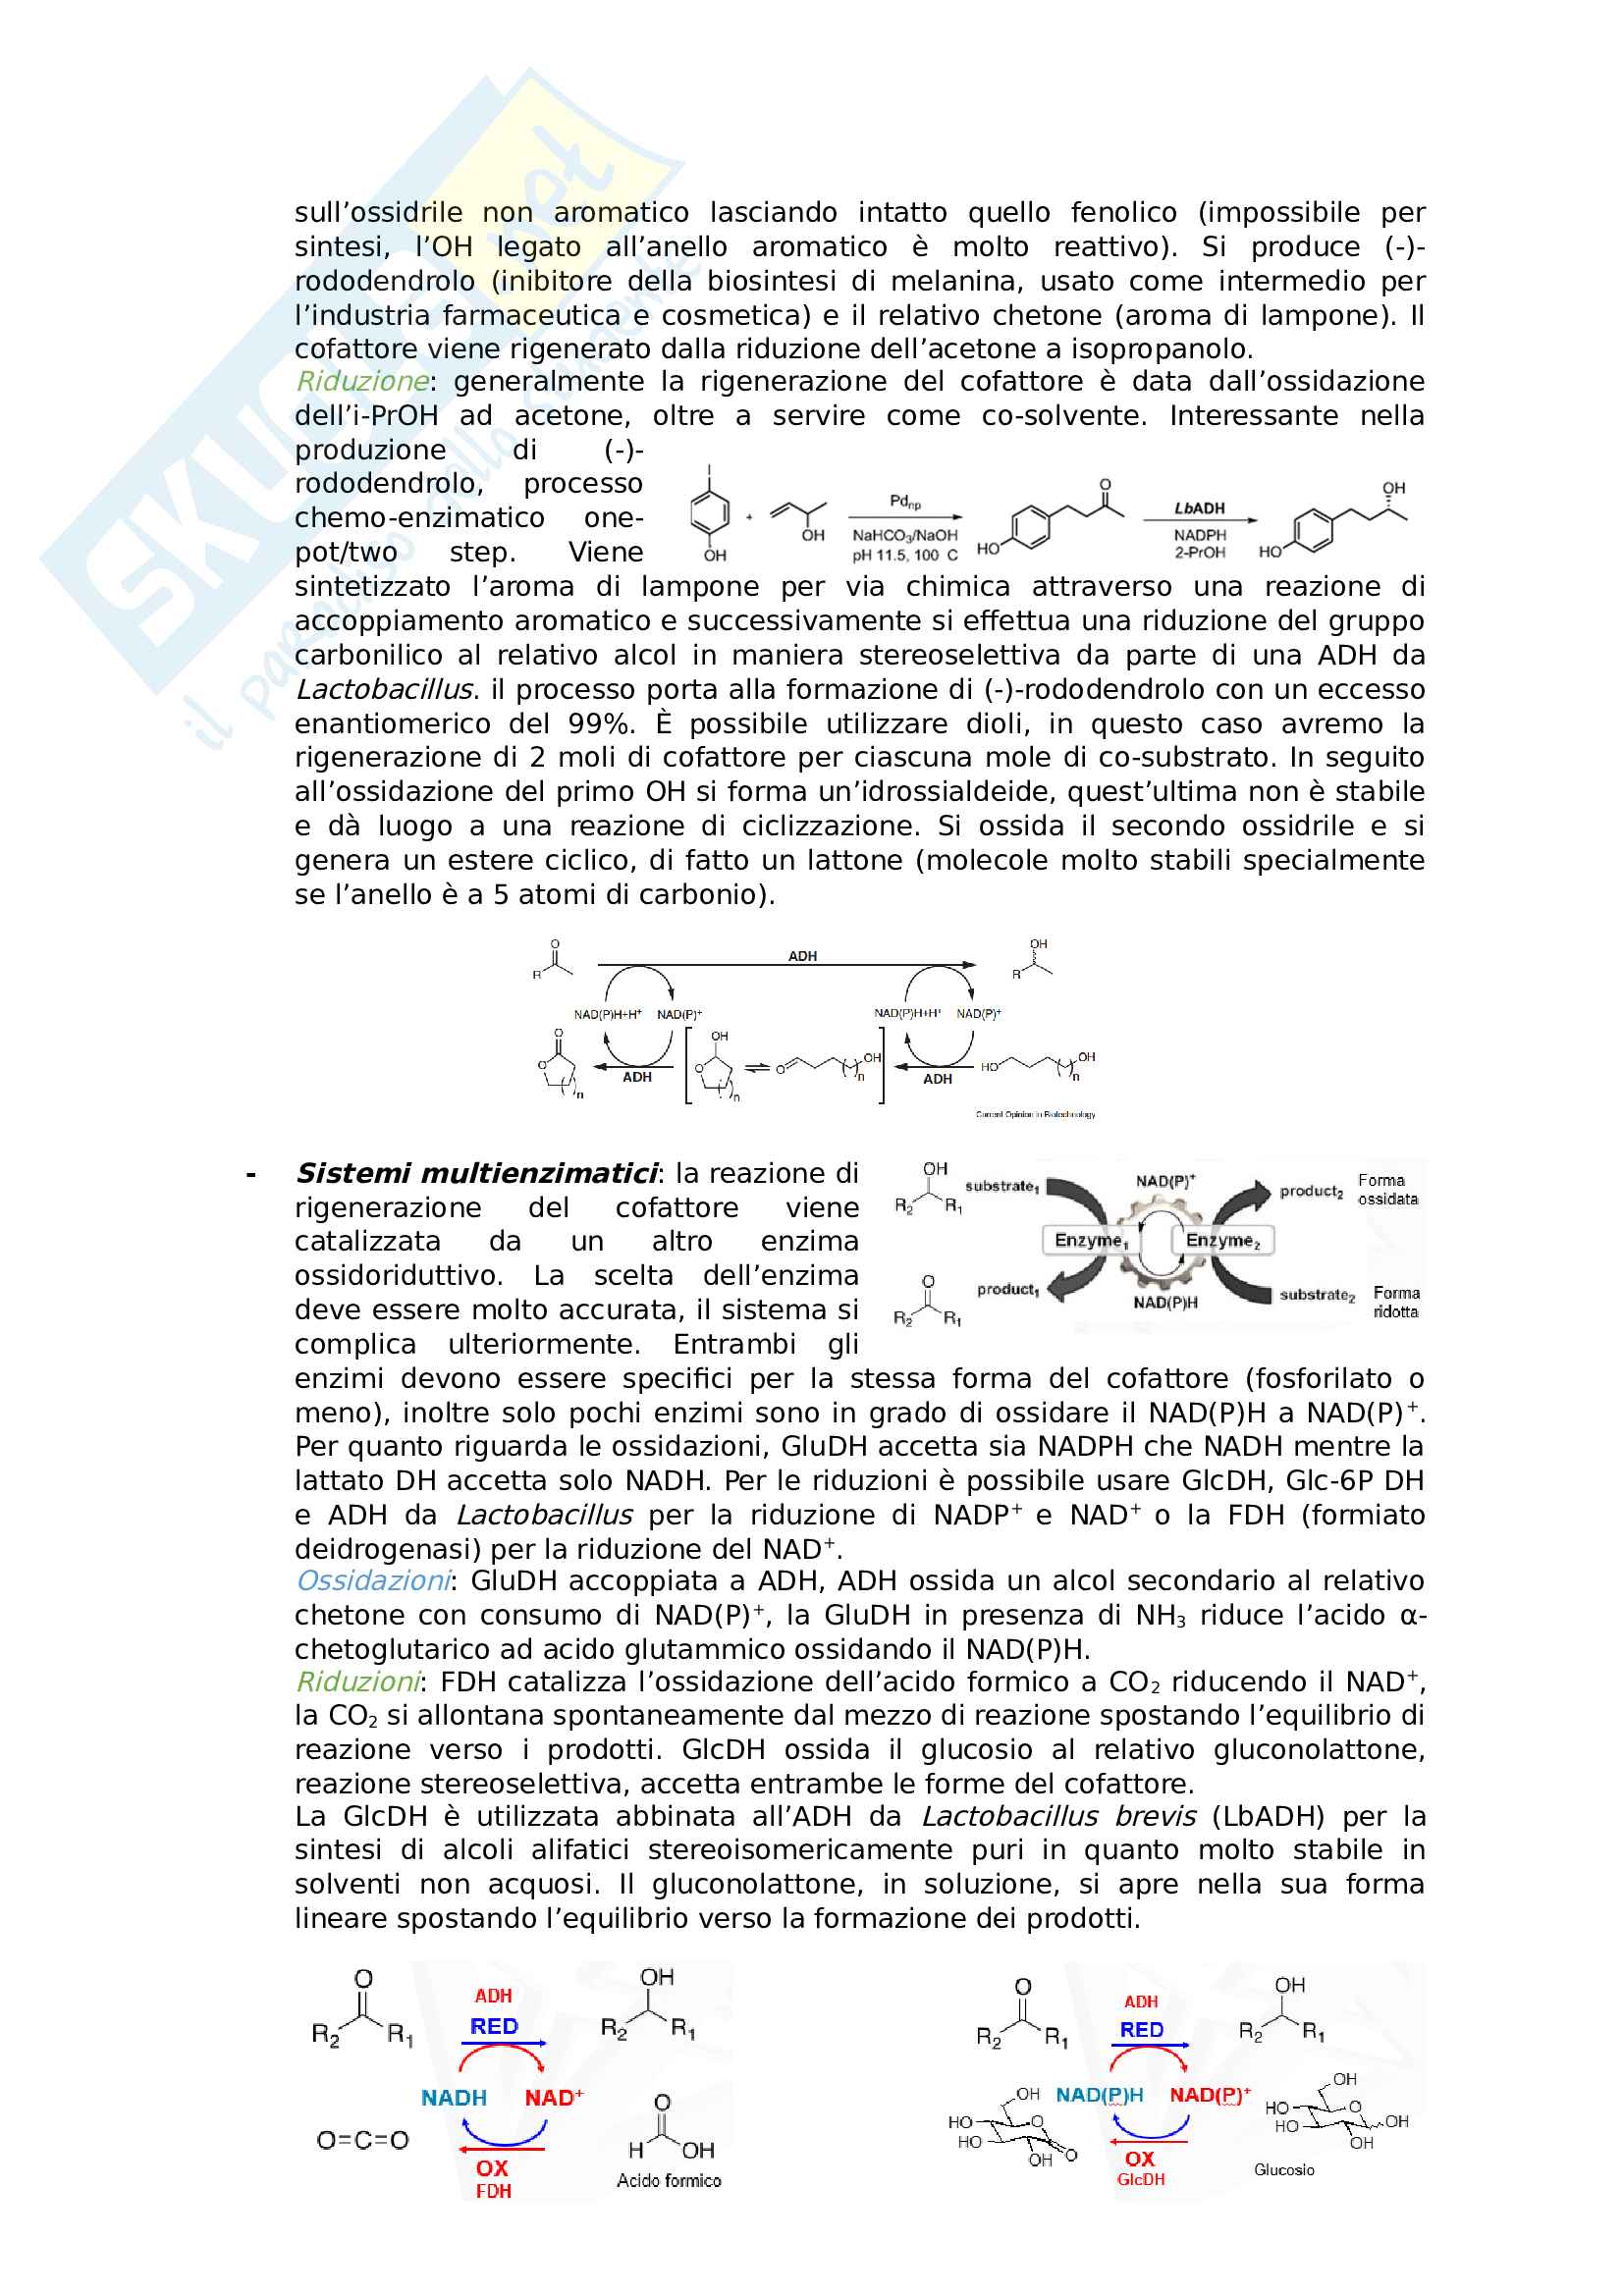 Chimica organica applicata alle biotecnologie Pag. 21